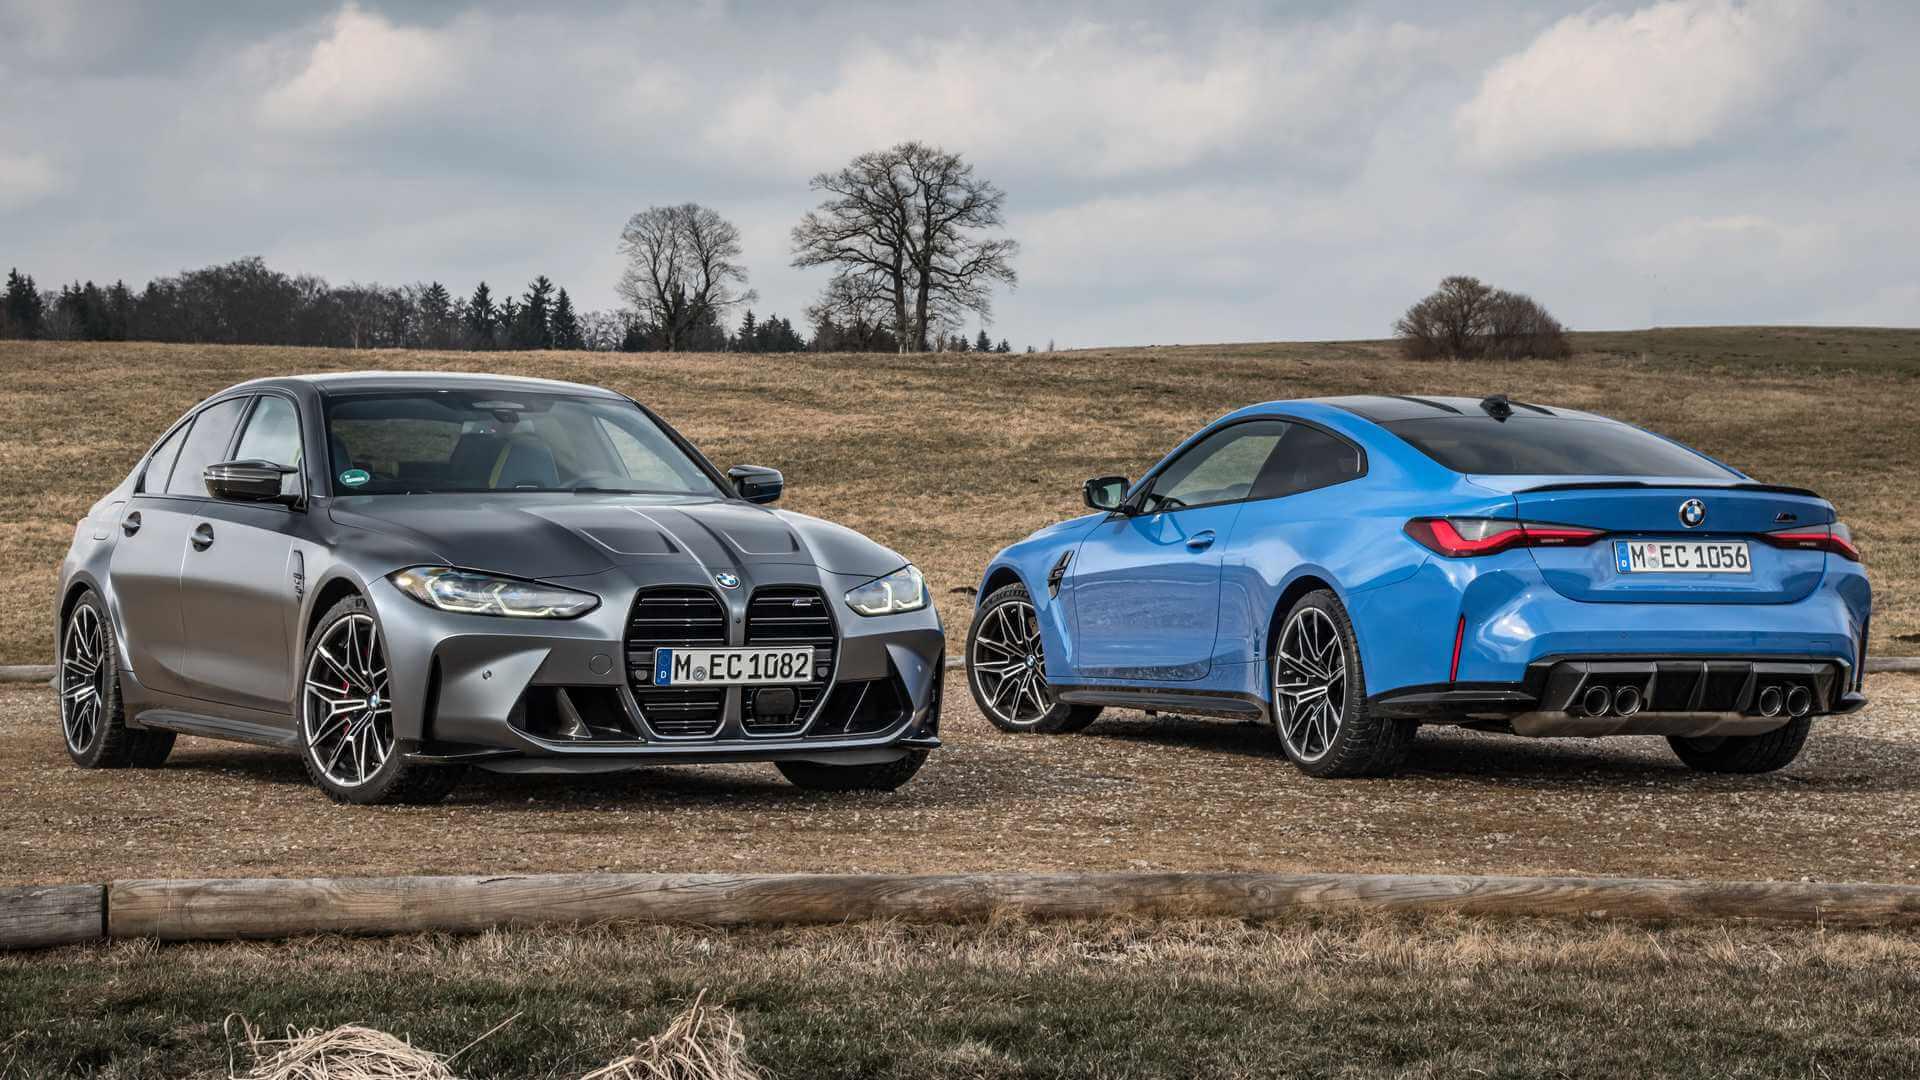 BMW rear-wheel-drive M3 Sedan and M4 Coupe